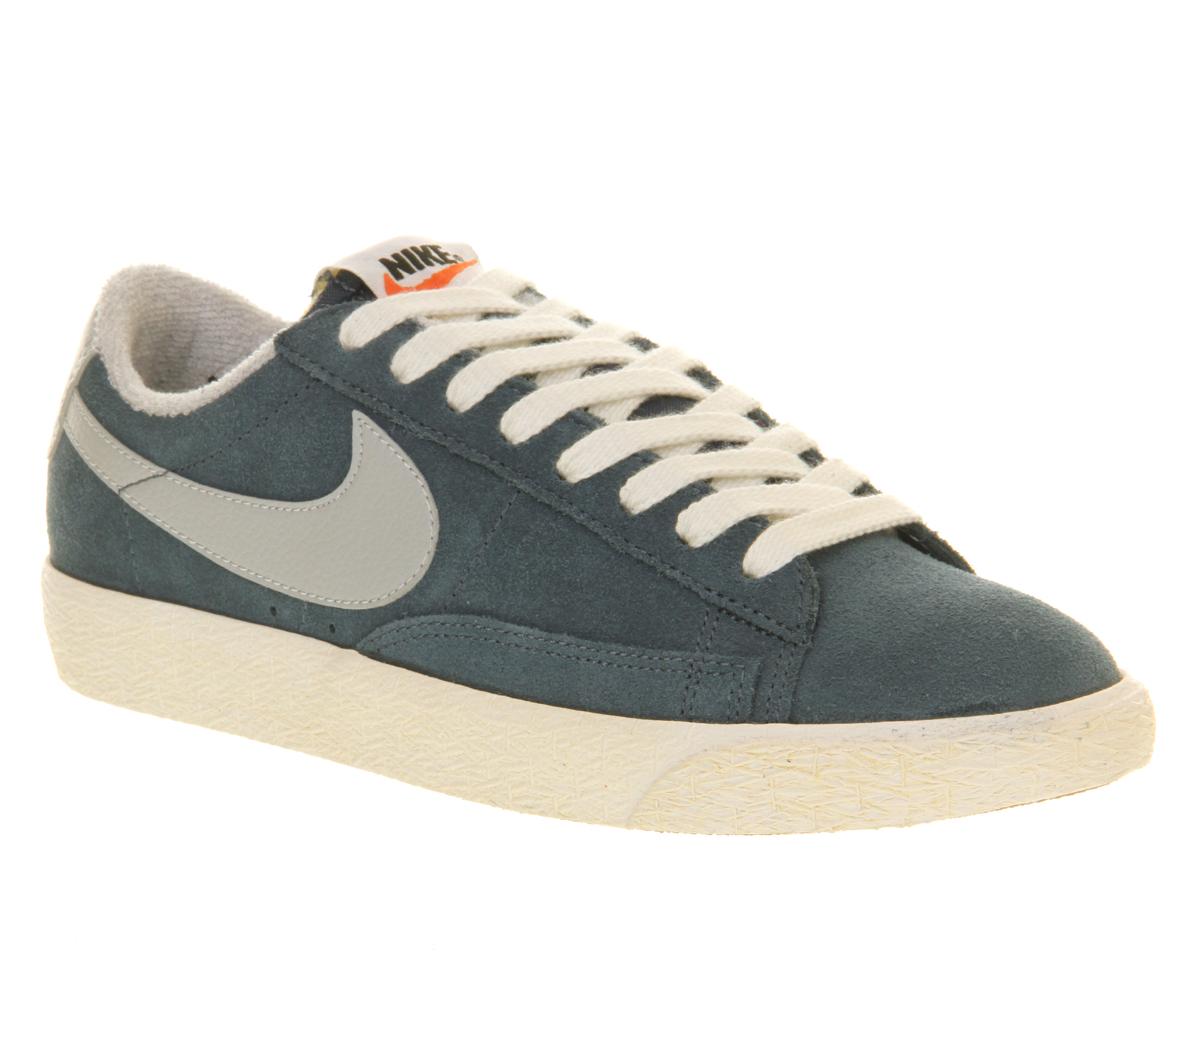 nike blazer low vintage squadron blue grey trainers shoes. Black Bedroom Furniture Sets. Home Design Ideas